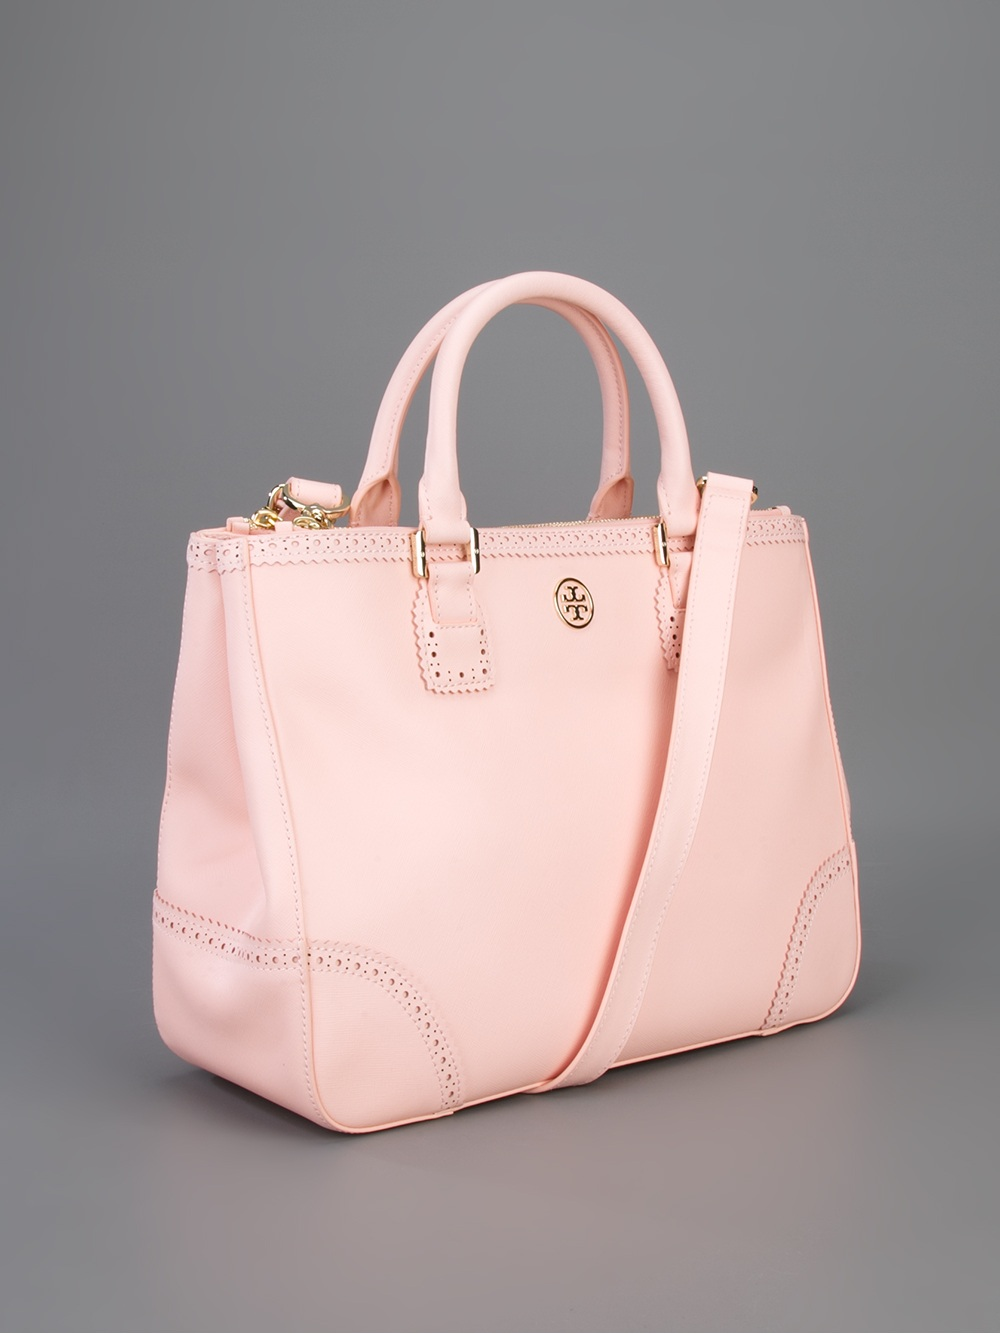 Lyst Tory Burch Robinson Spectator Bag In Pink